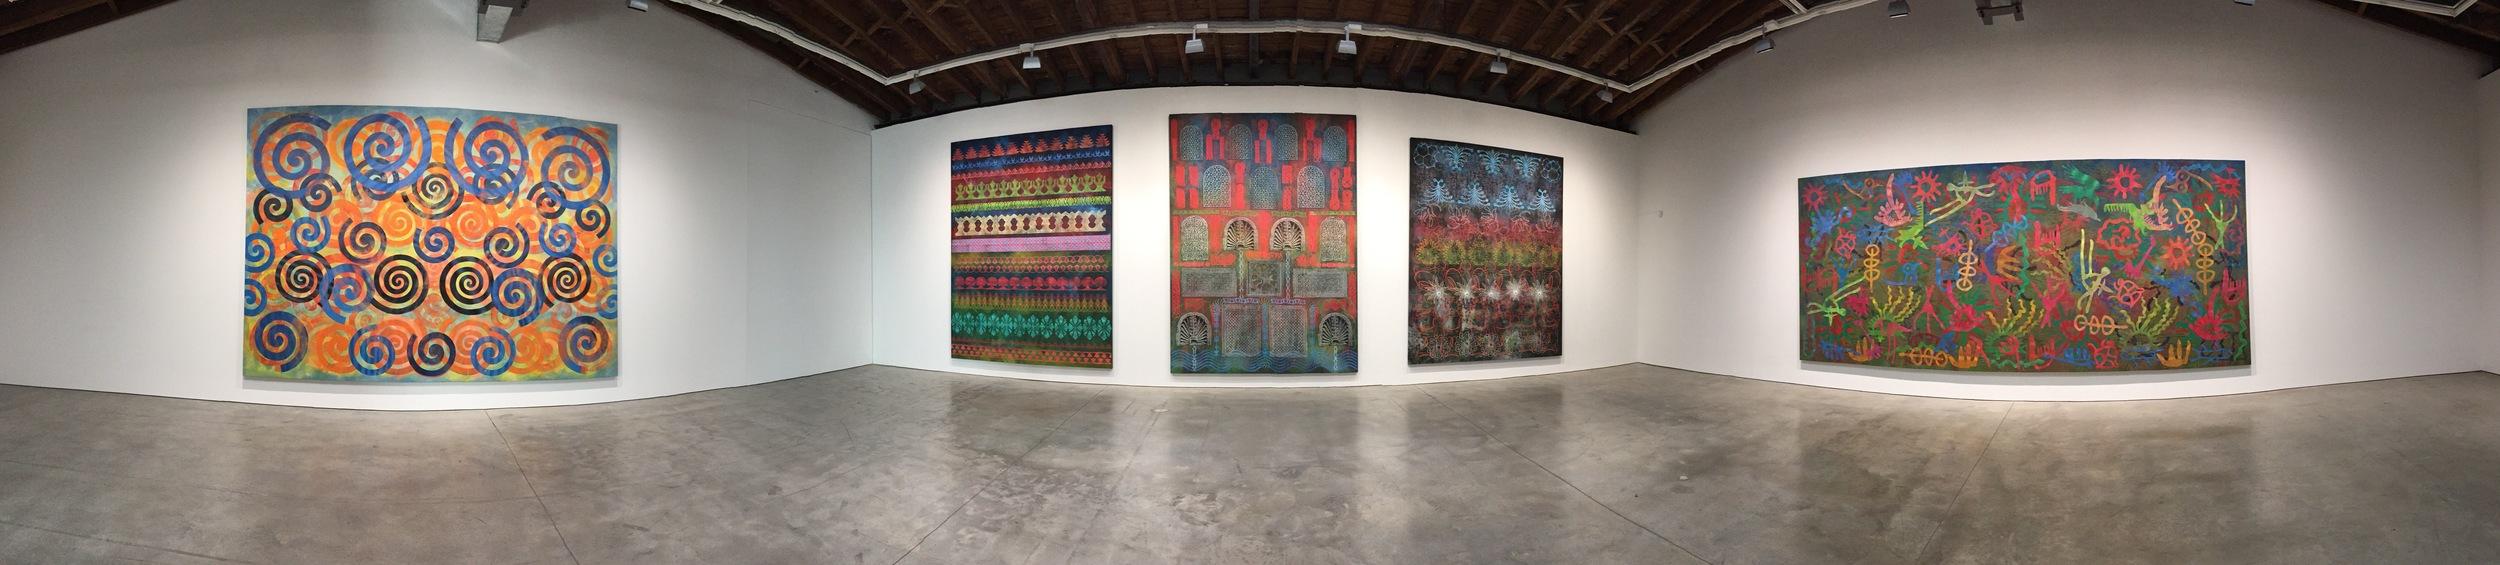 Exhibition Image,   Philip Taaffe  , Luhring Augustine, Bushwick, New York.   Photo Credit:Cincala Art Advisory